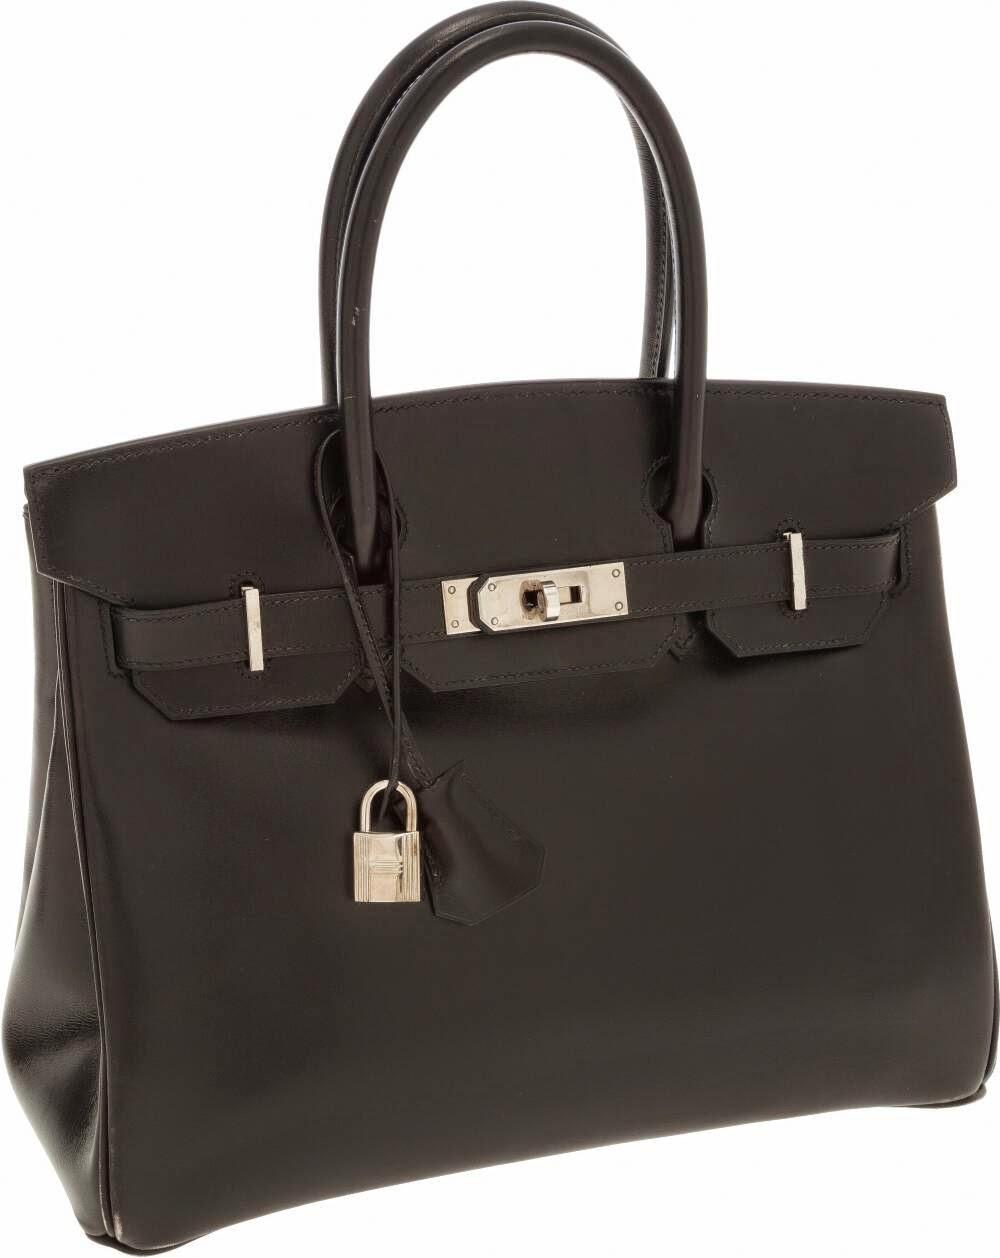 7dfc50eac8 Hermes 30cm Black Calf Box Leather Hermes Birkin Bag with Palladium  Hardware